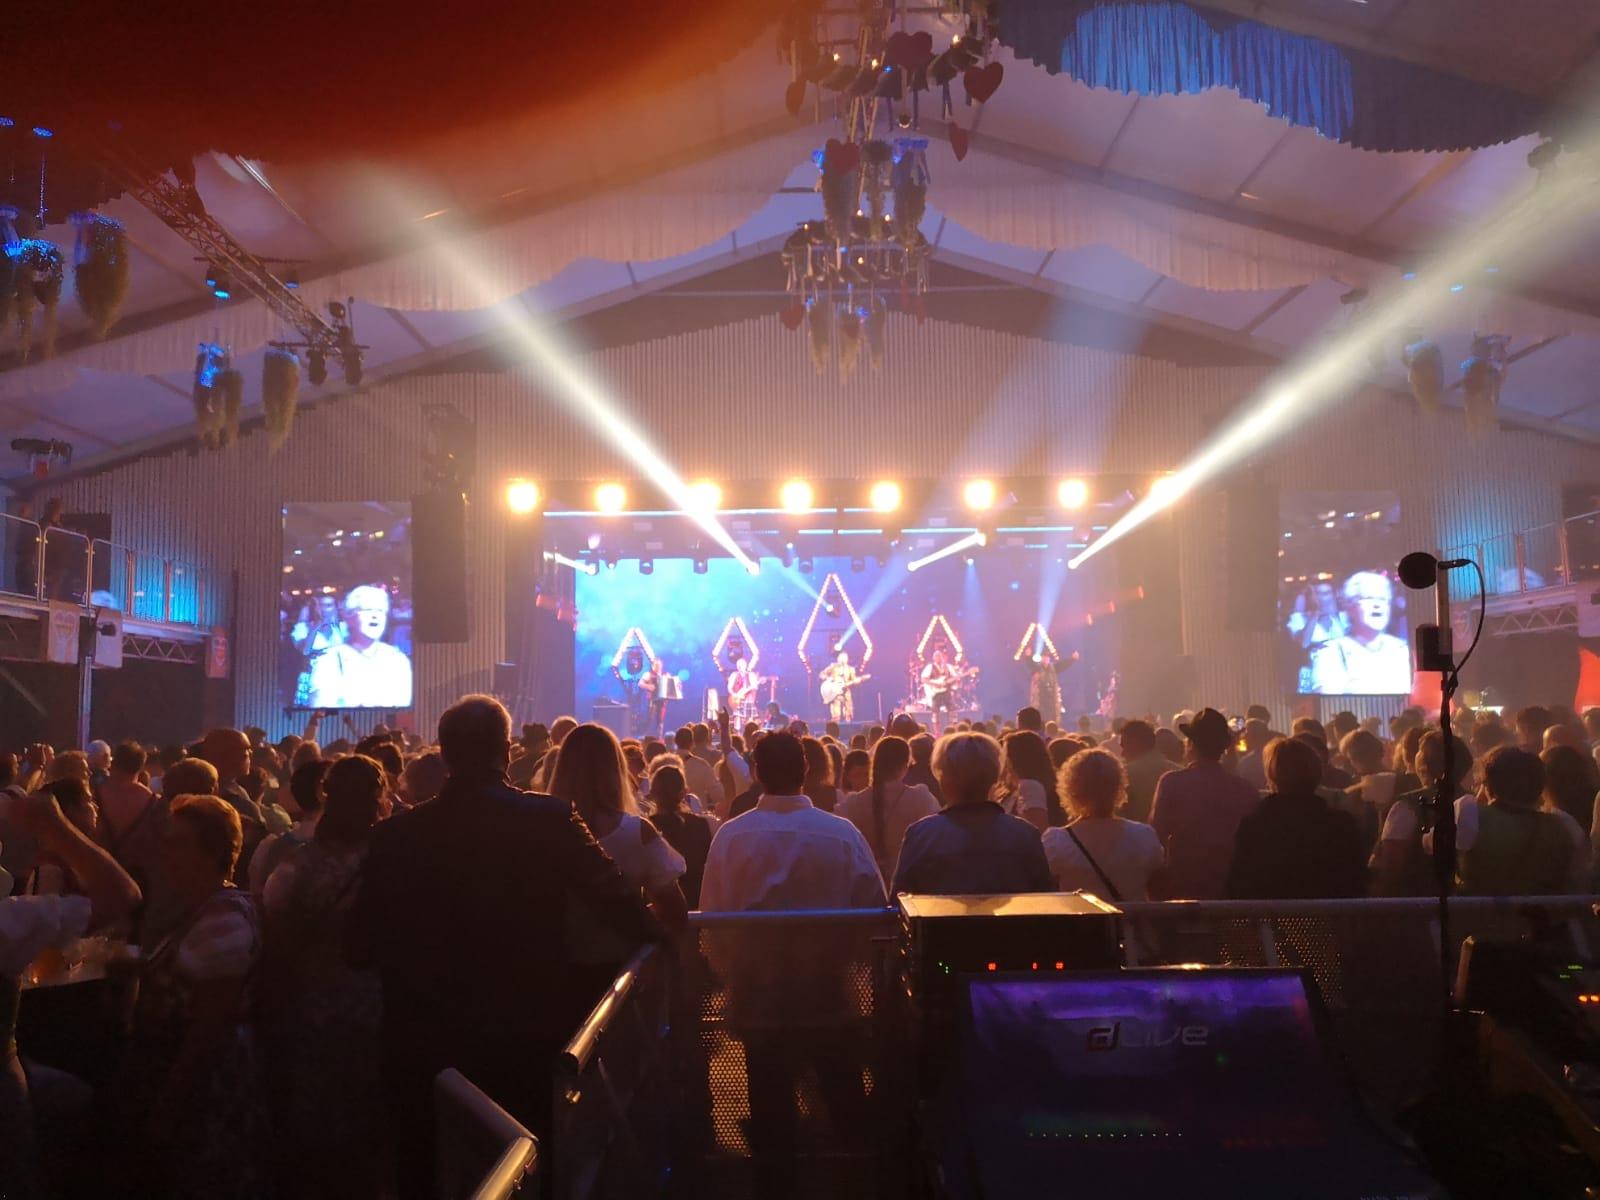 Vollgas Orchester Best of 43 Lightshow